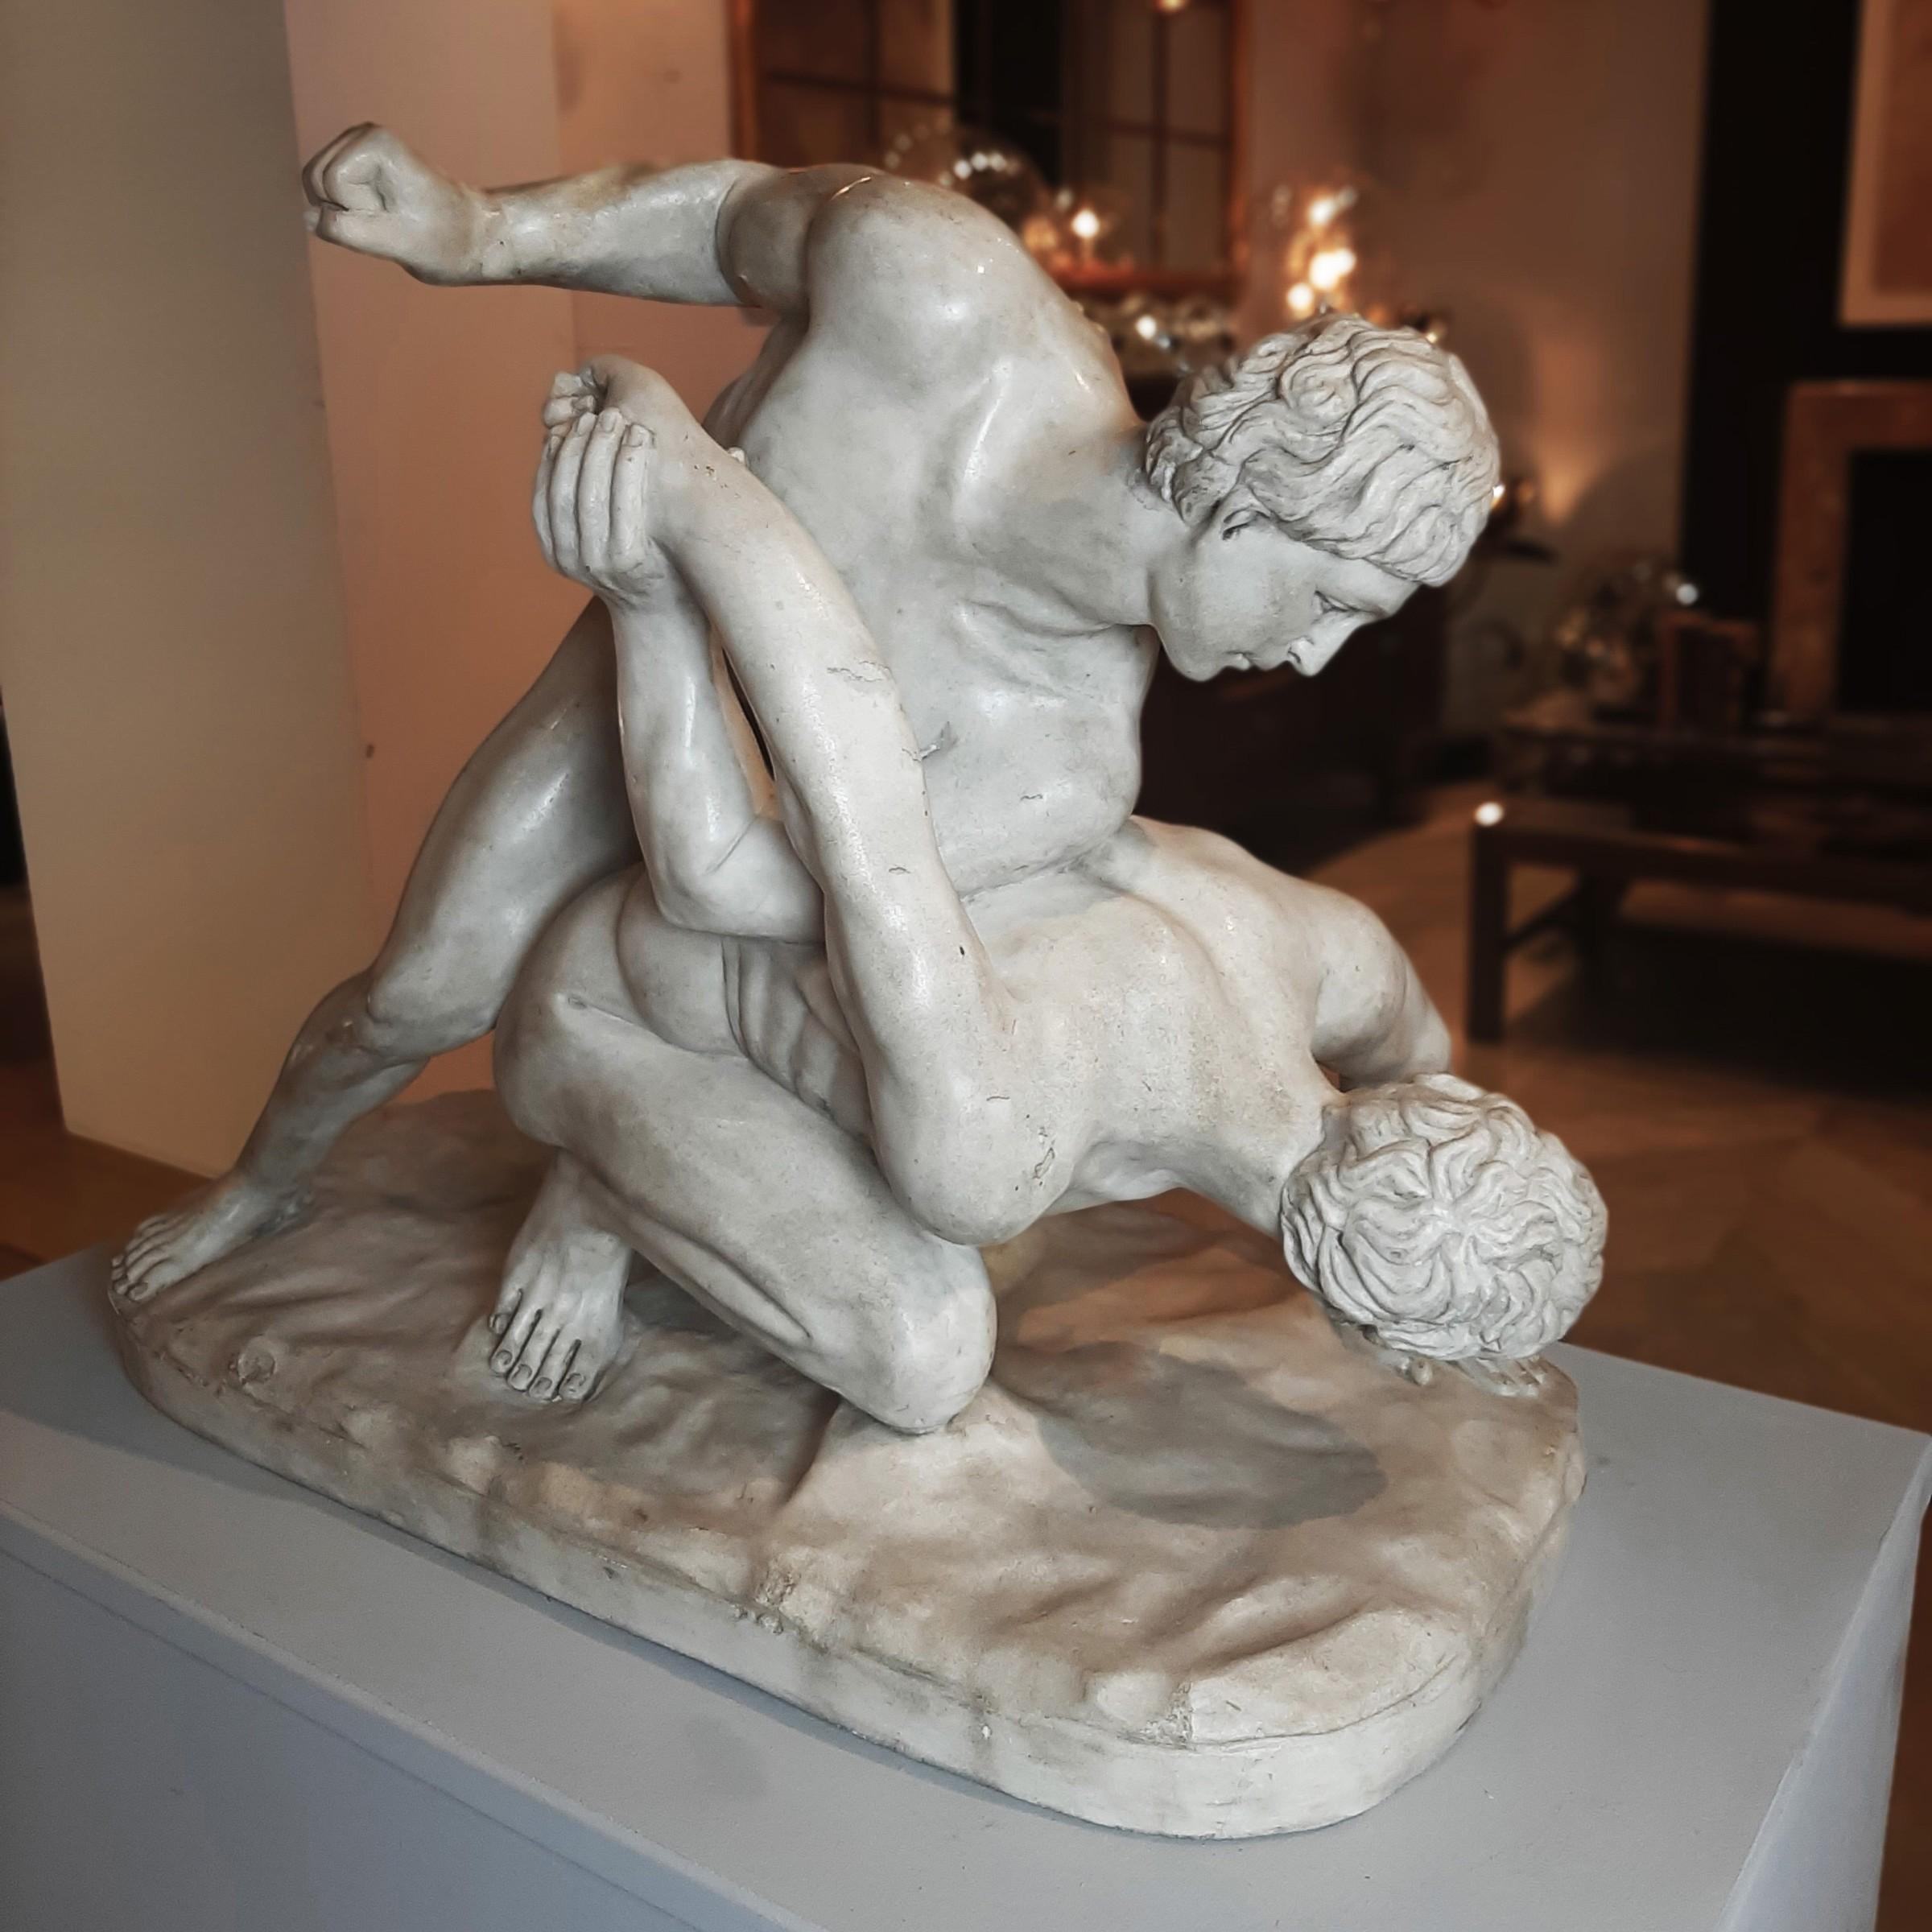 19e-eeuwse Grand Tour-marmeren sculptuur na de antieke Uffizi-worstelaars